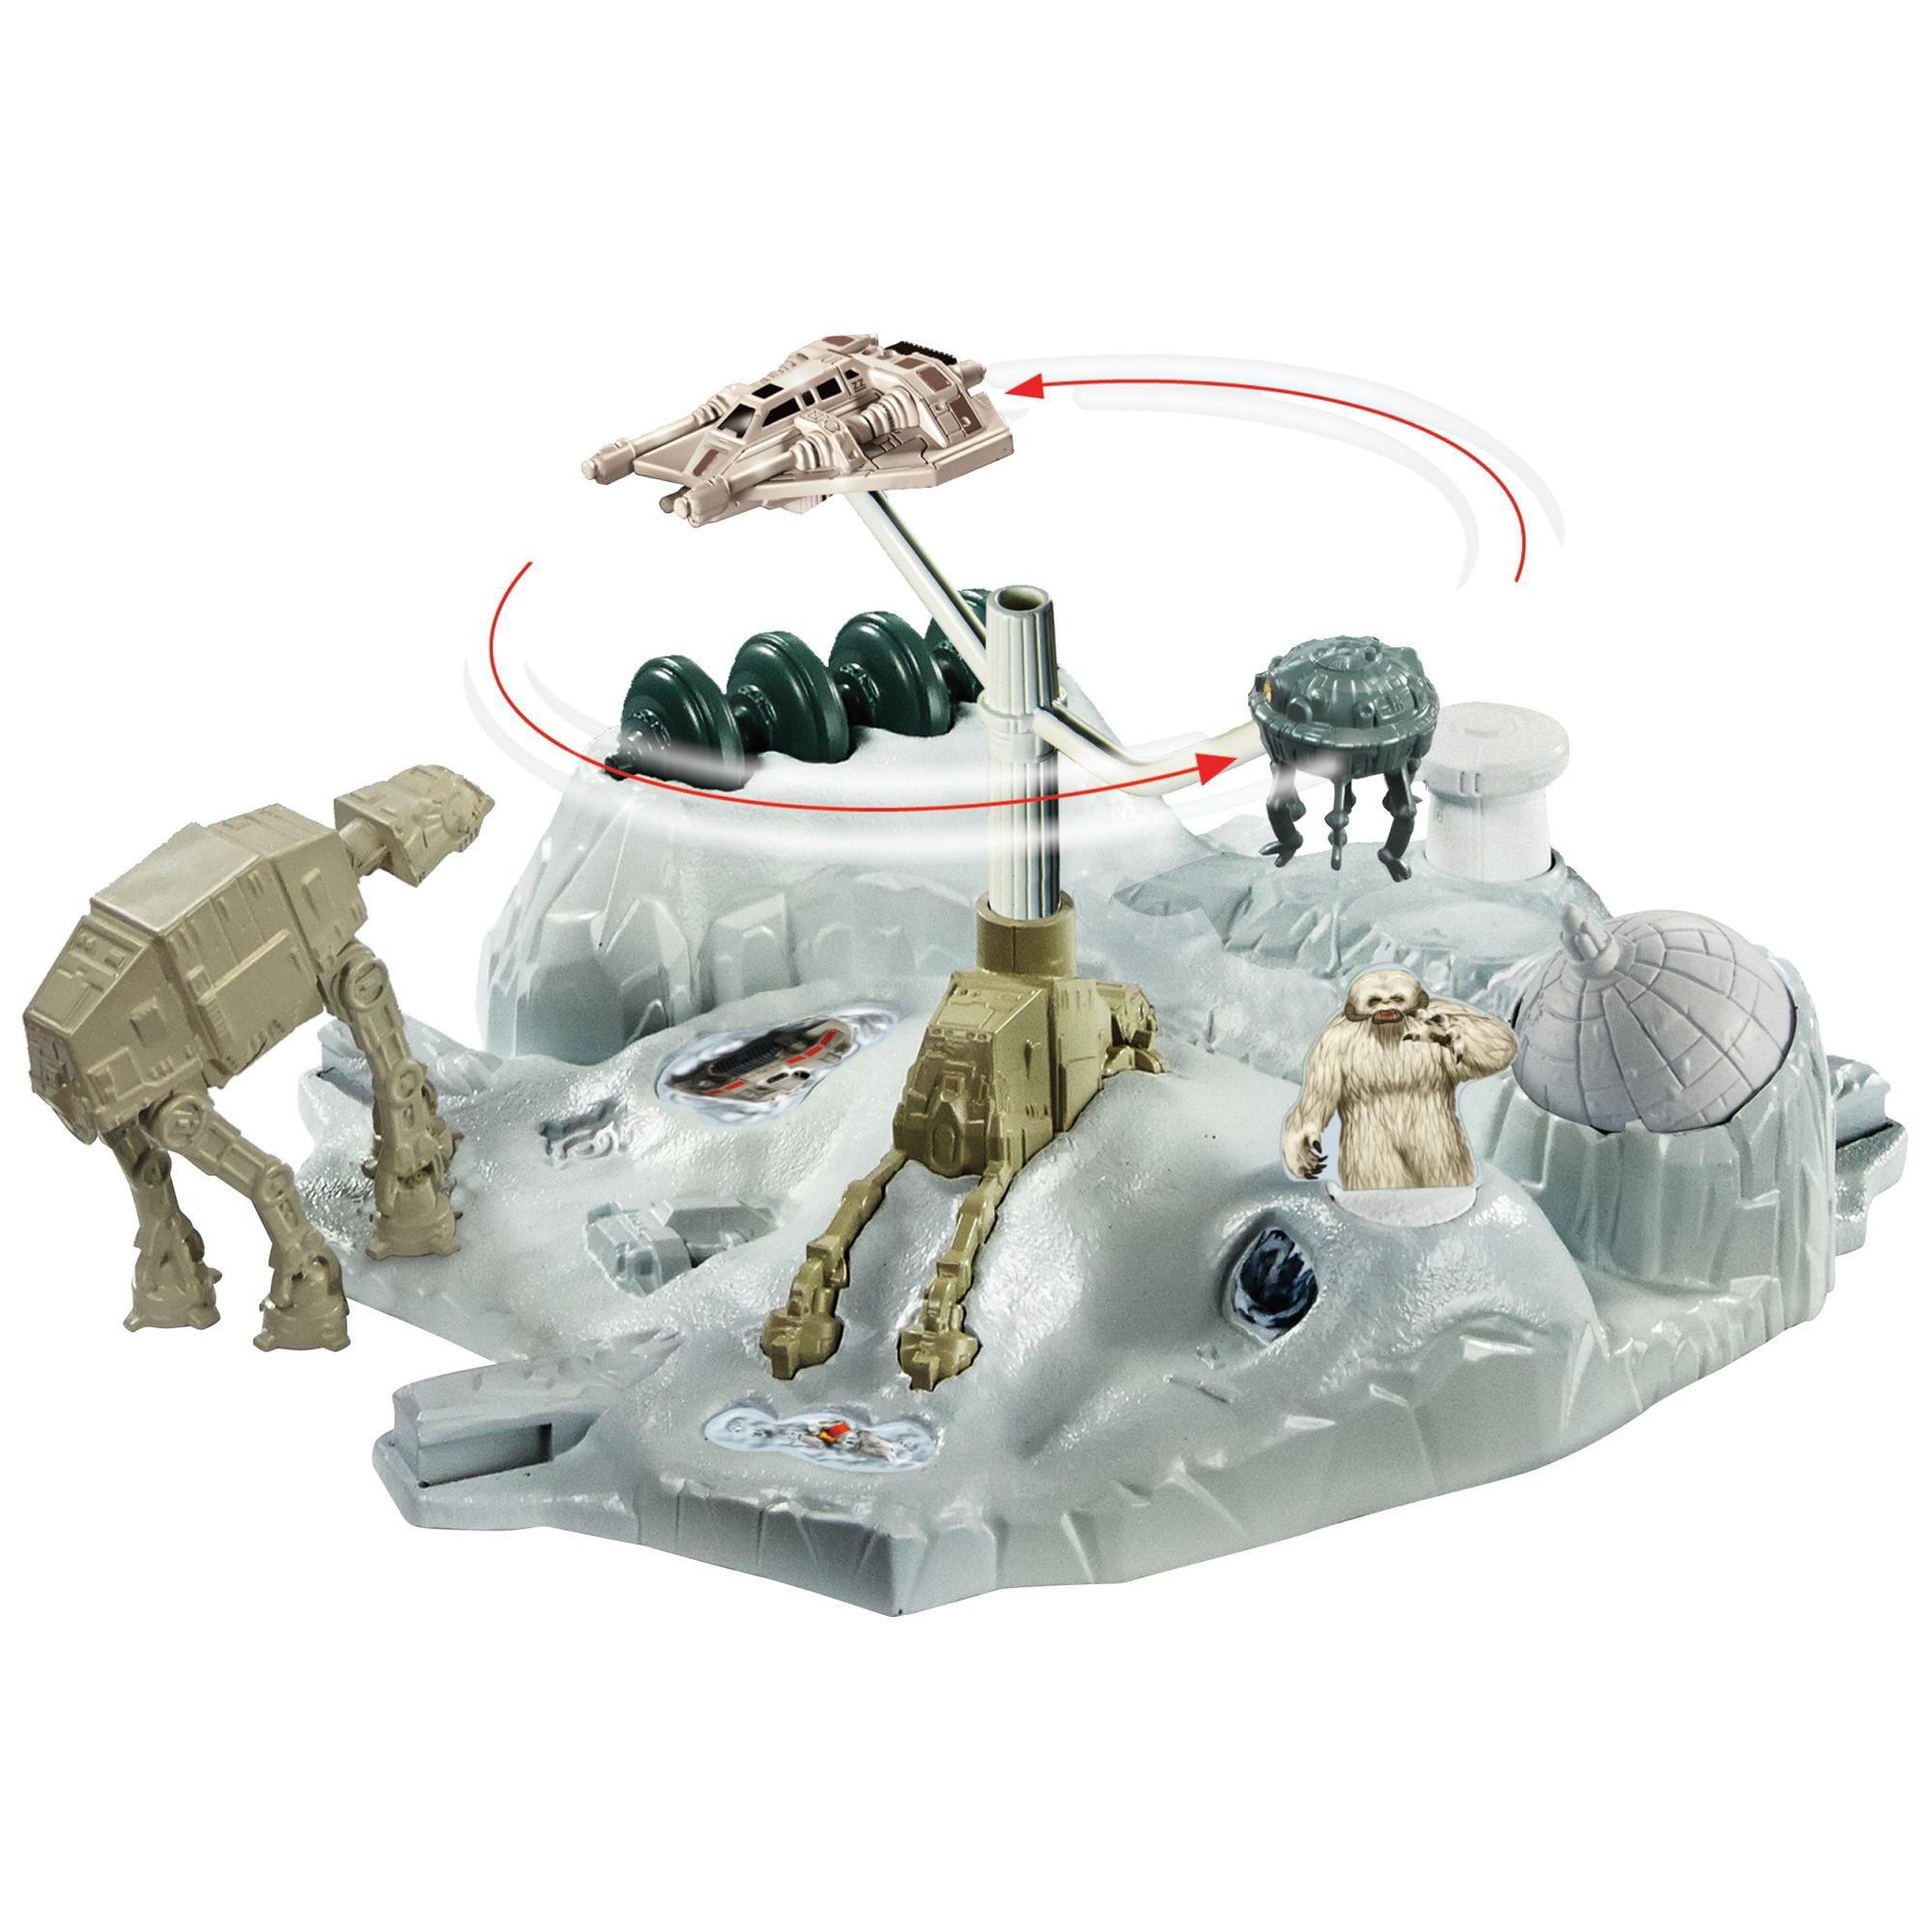 Hot Wheels Star Wars Hoth Echo Base Battle Play Set by Mattel